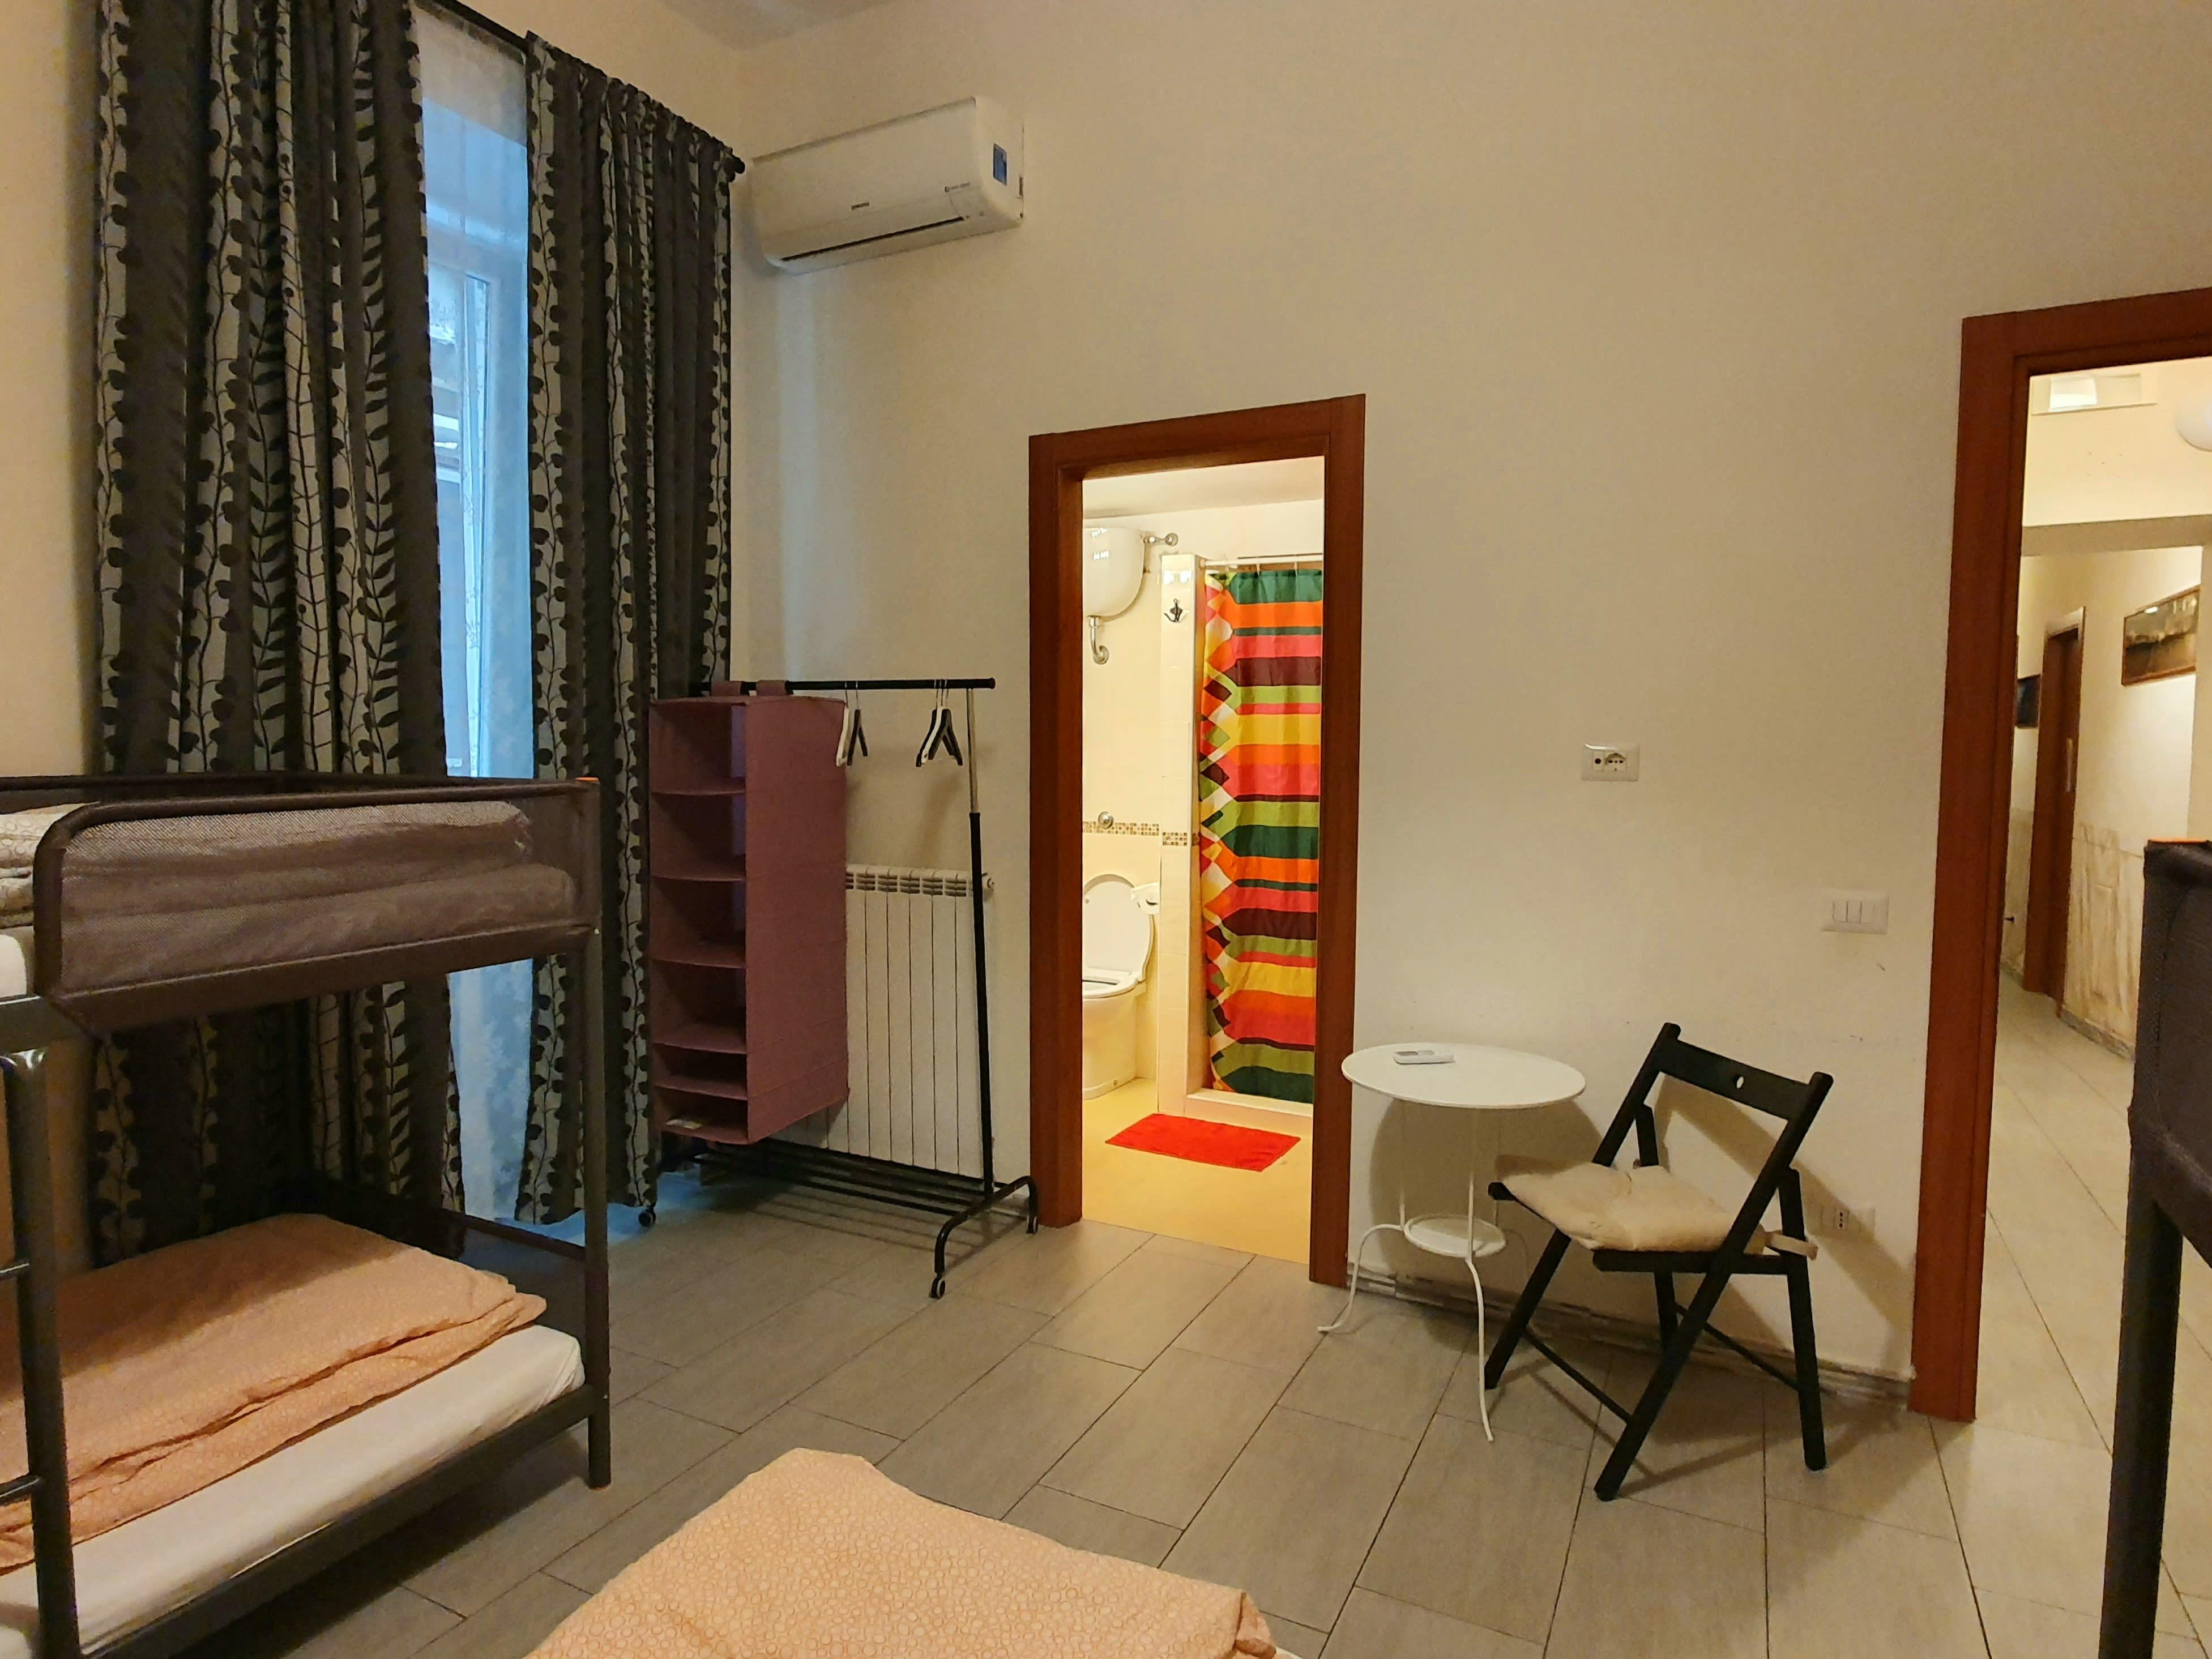 Hostel Mancini